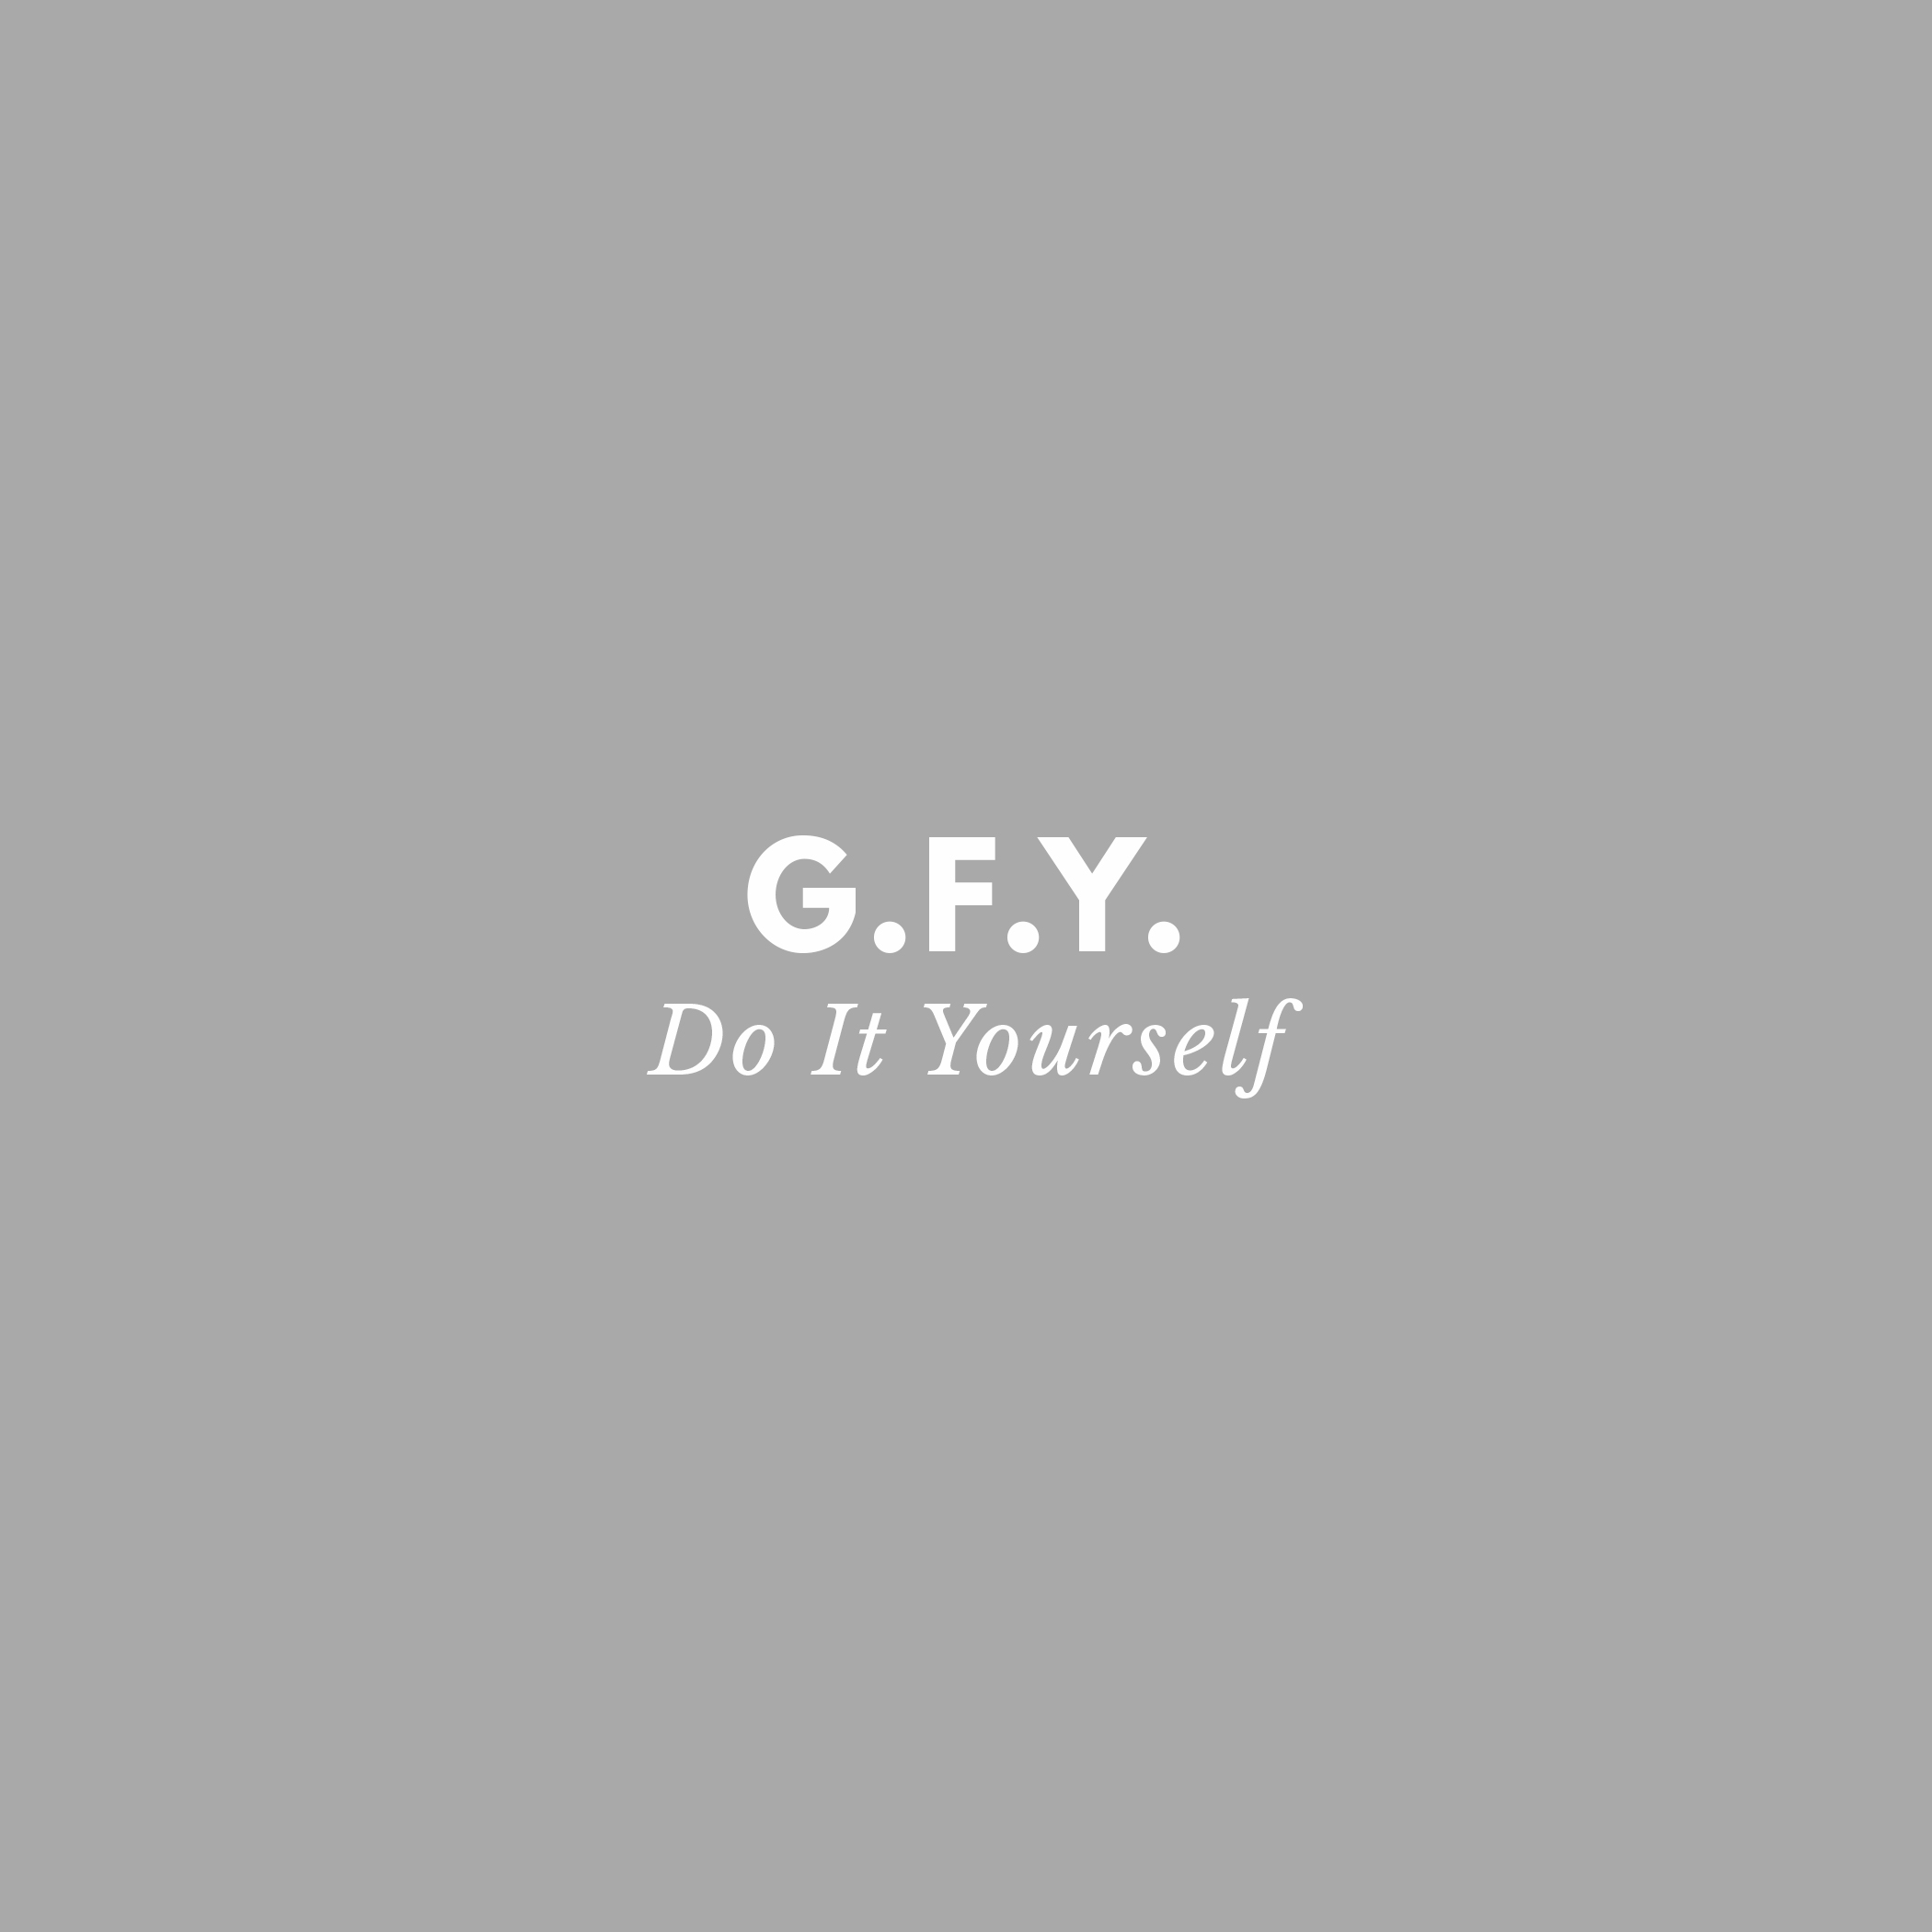 GFY-Title.jpg